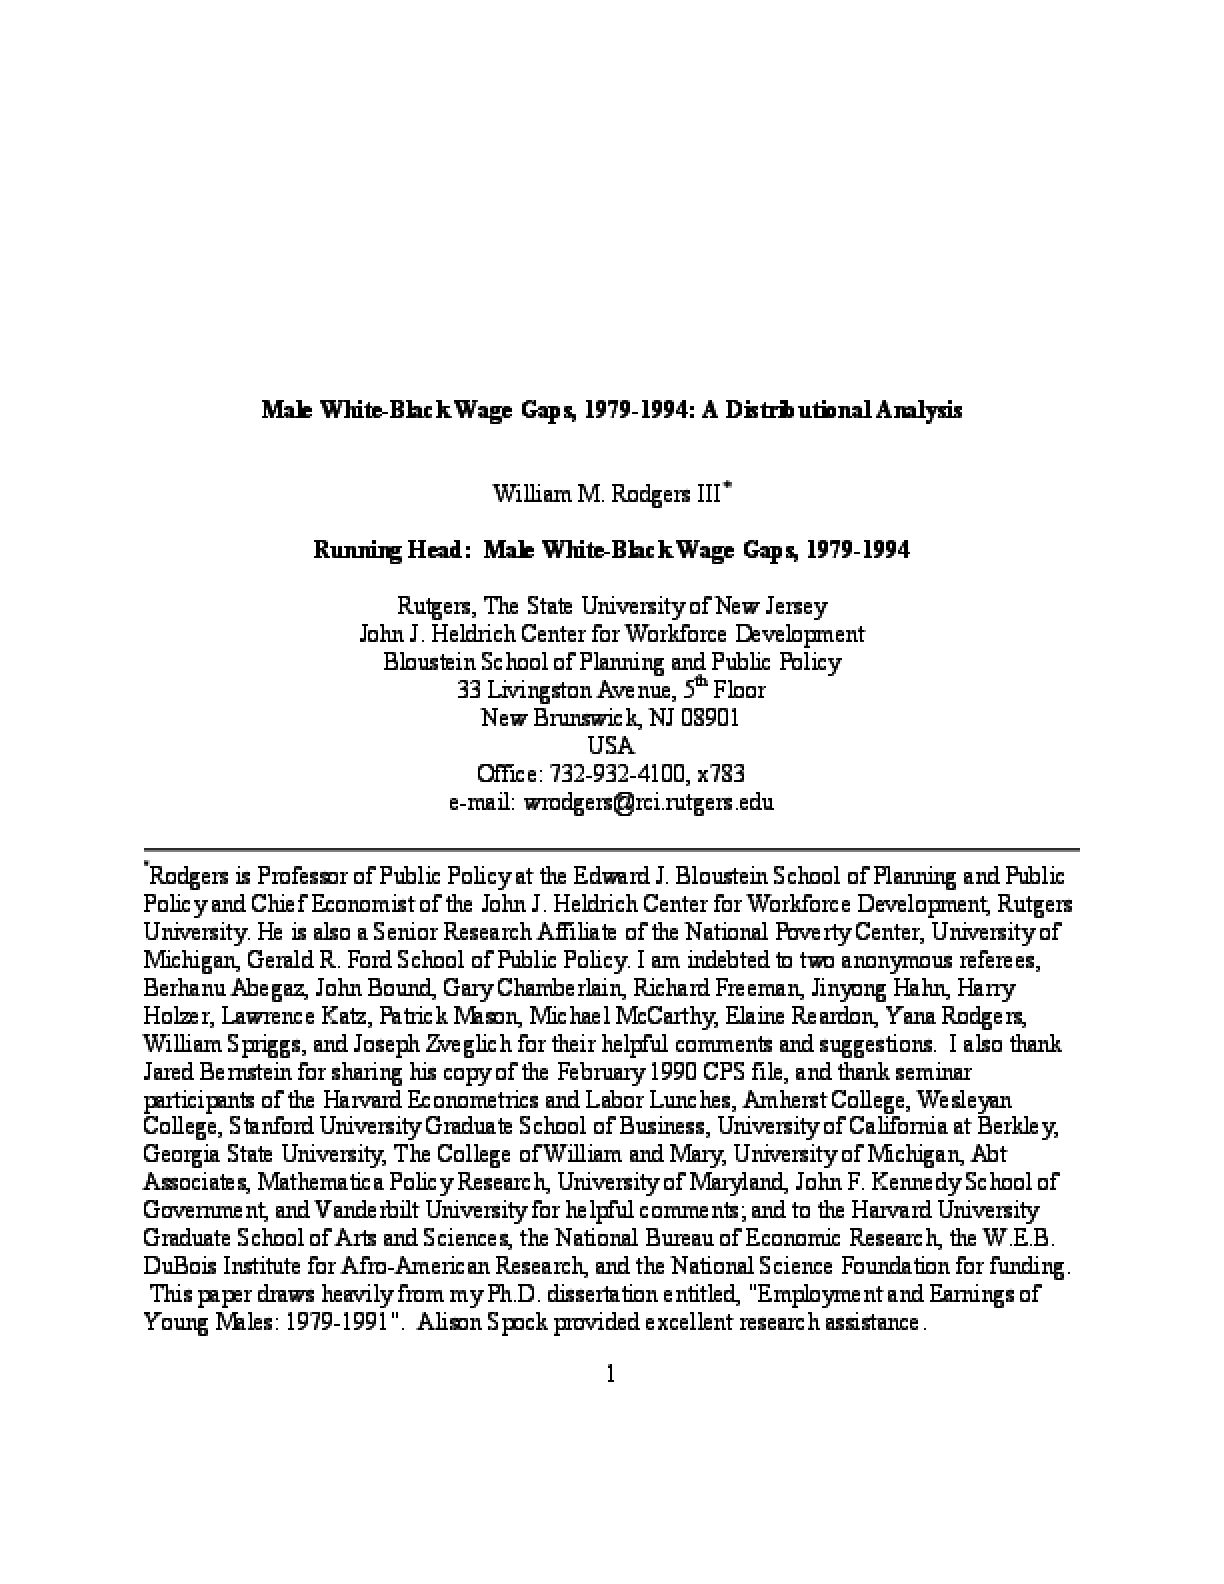 Male White-Black Wage Gaps, 1979-1994: A Distributional Analysis